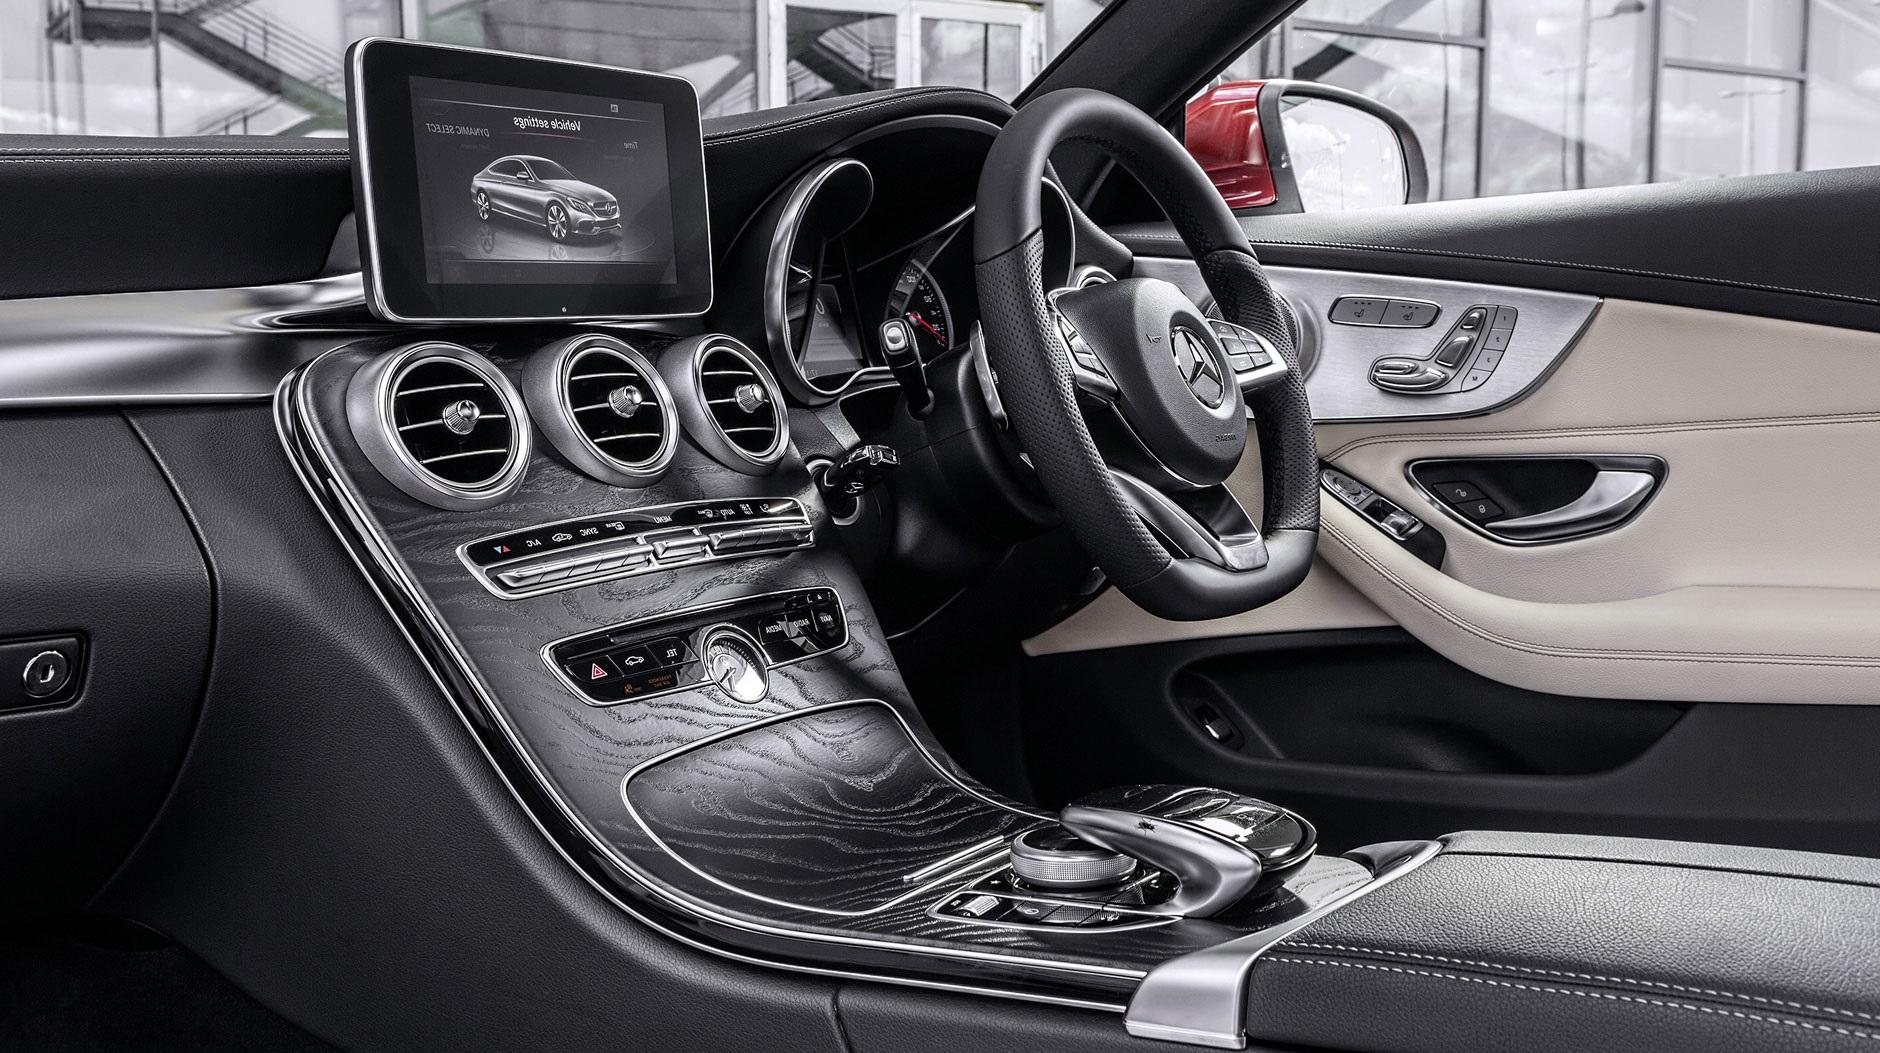 Mercedes Benz C Class Coupe Petrol